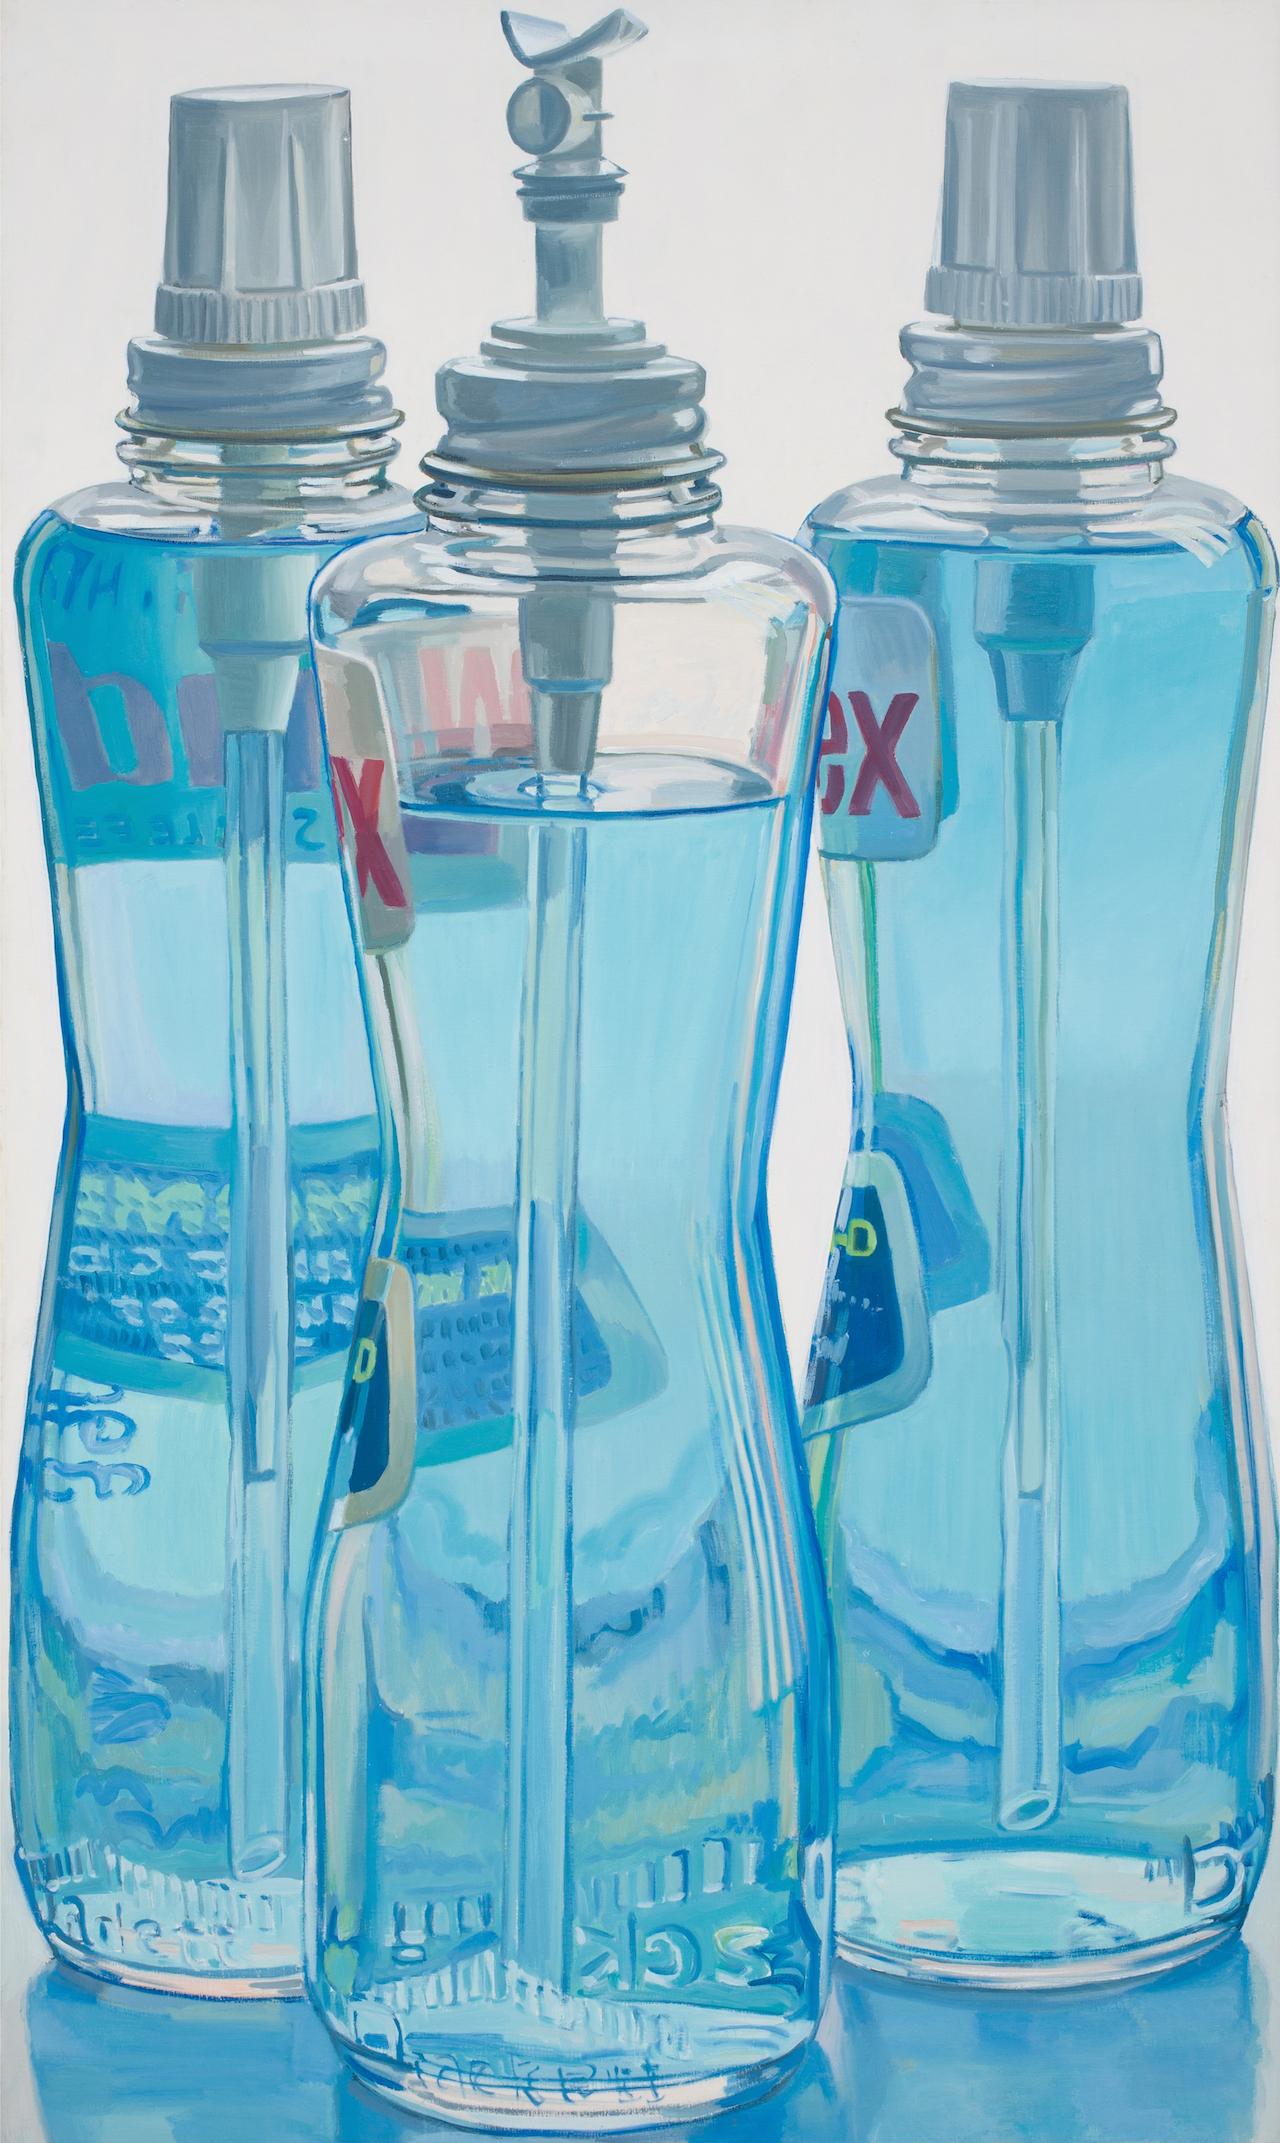 "Janet Fish, ""Windex Bottles"" (1971–72), oil on linen, 49 3/4 x 29 3/4 in"